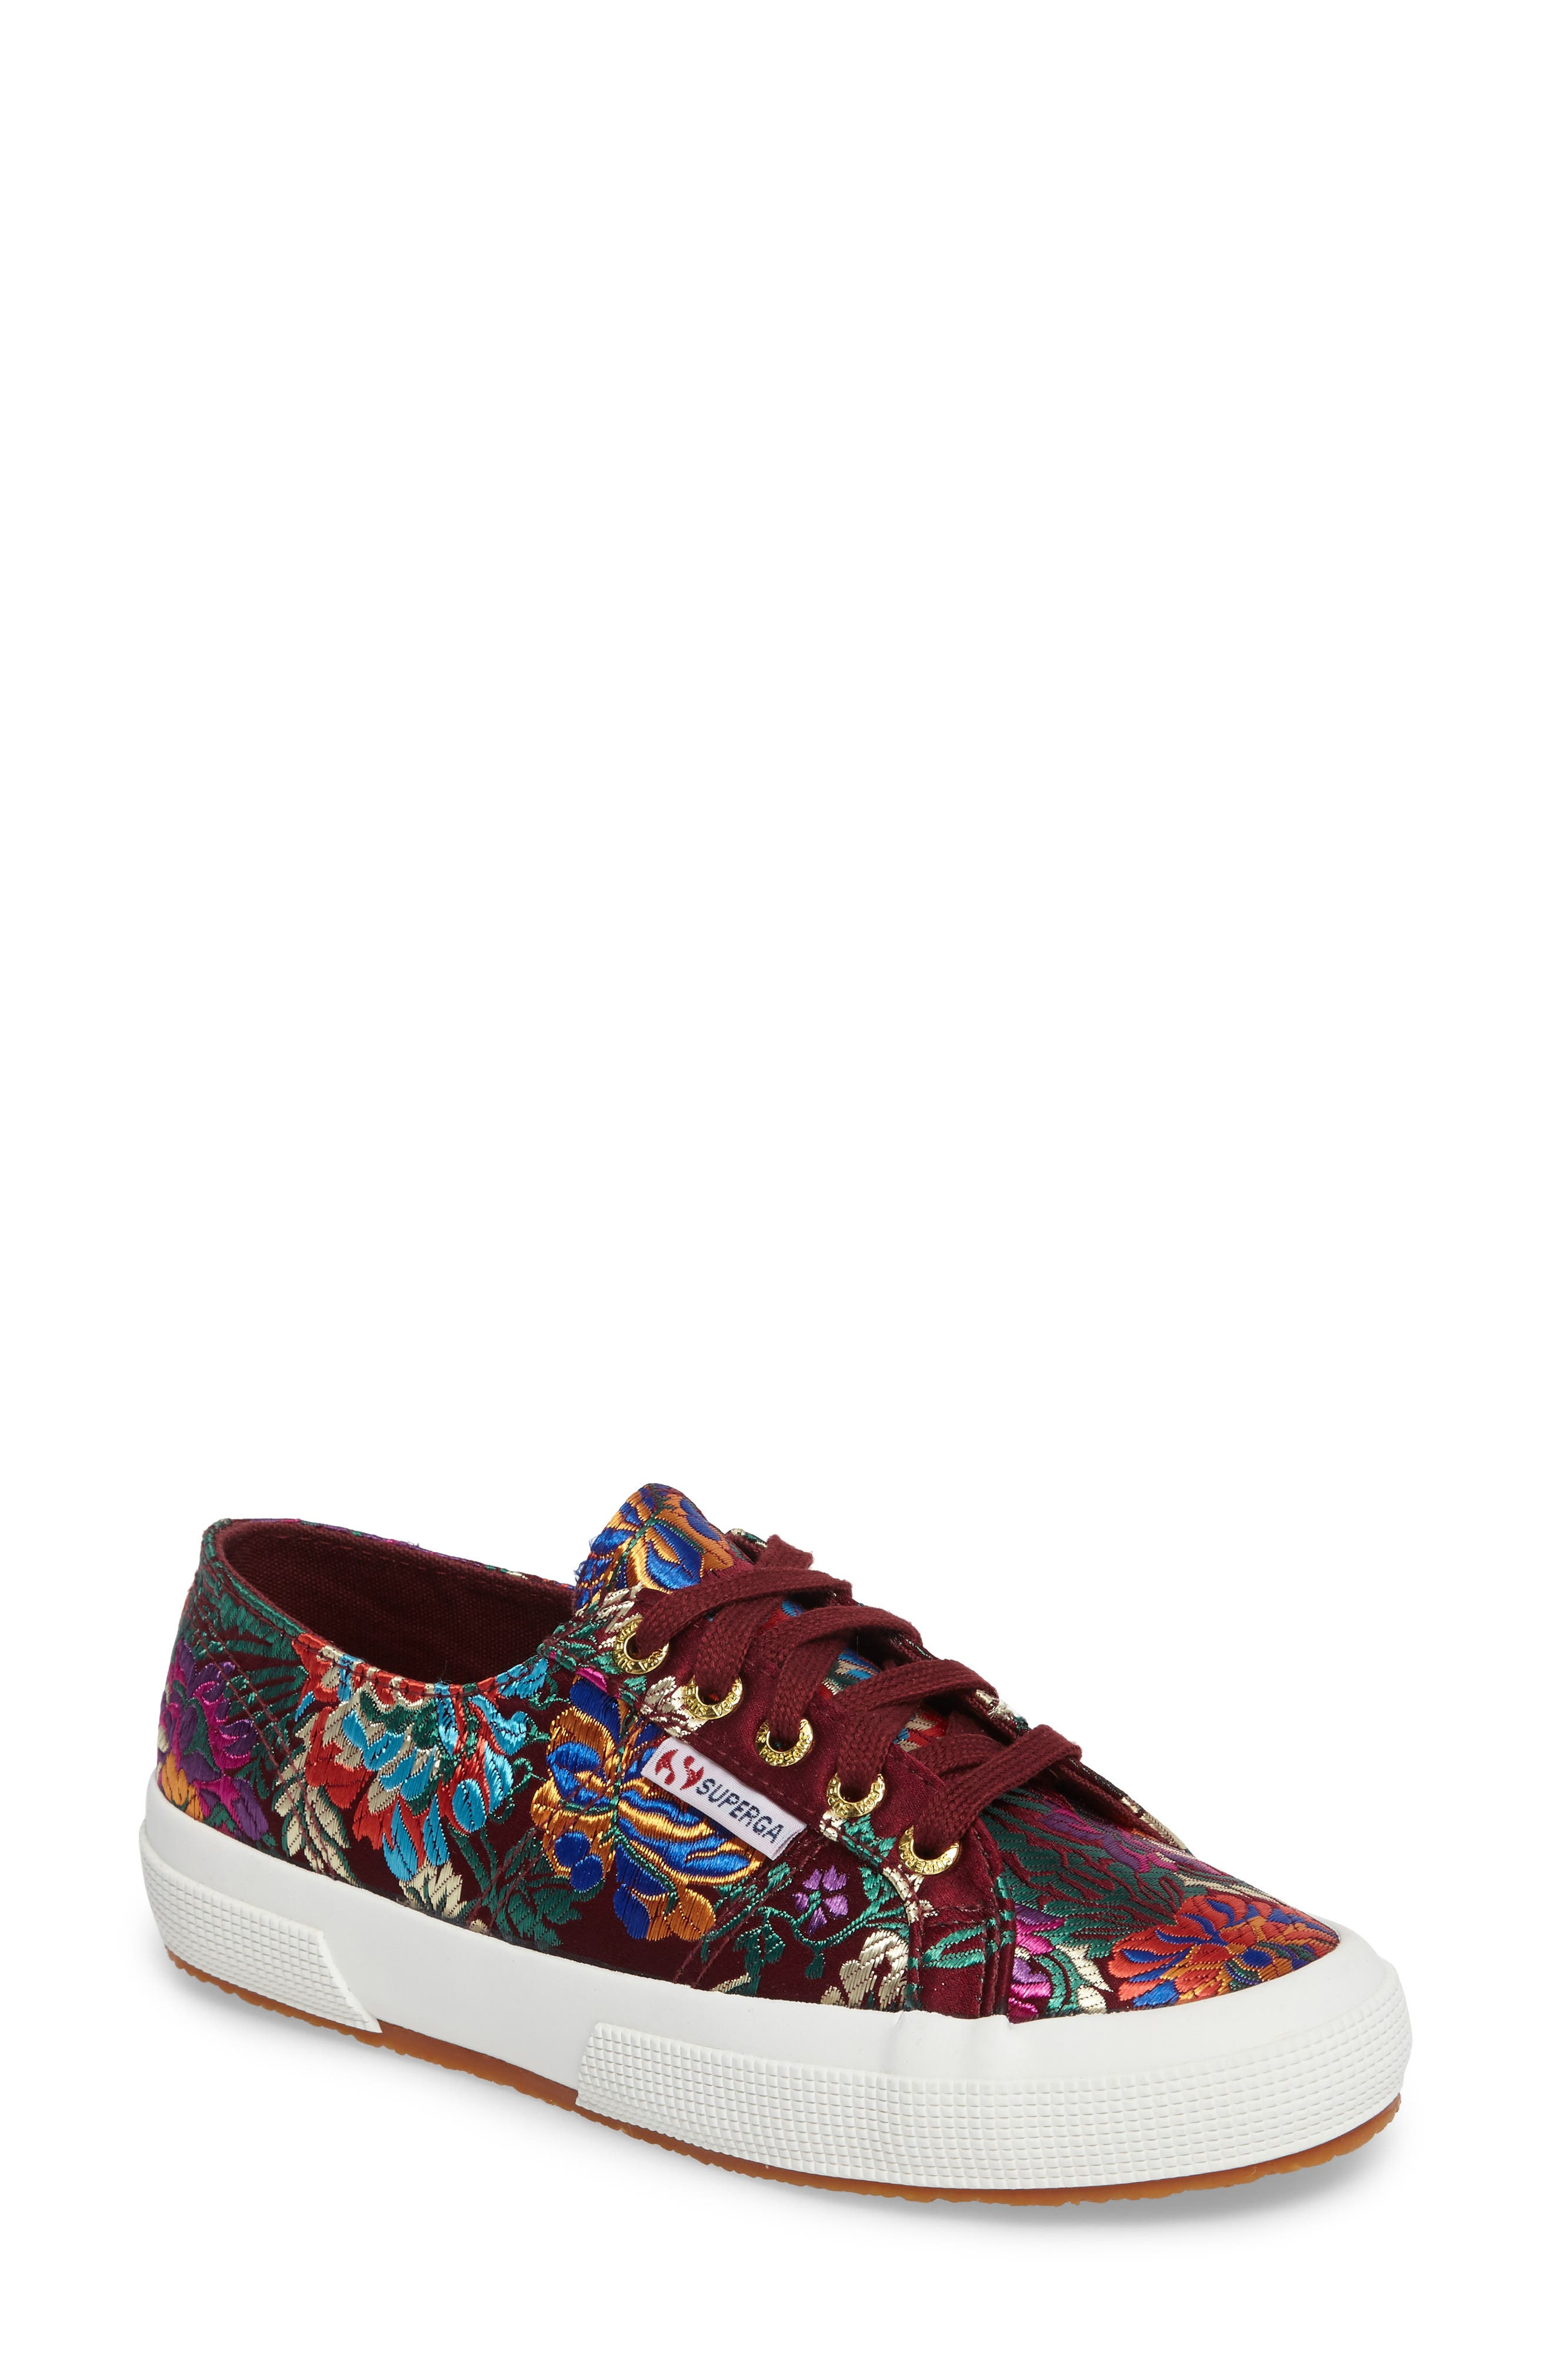 Superga 2750 Embroidered Sneaker (Women)